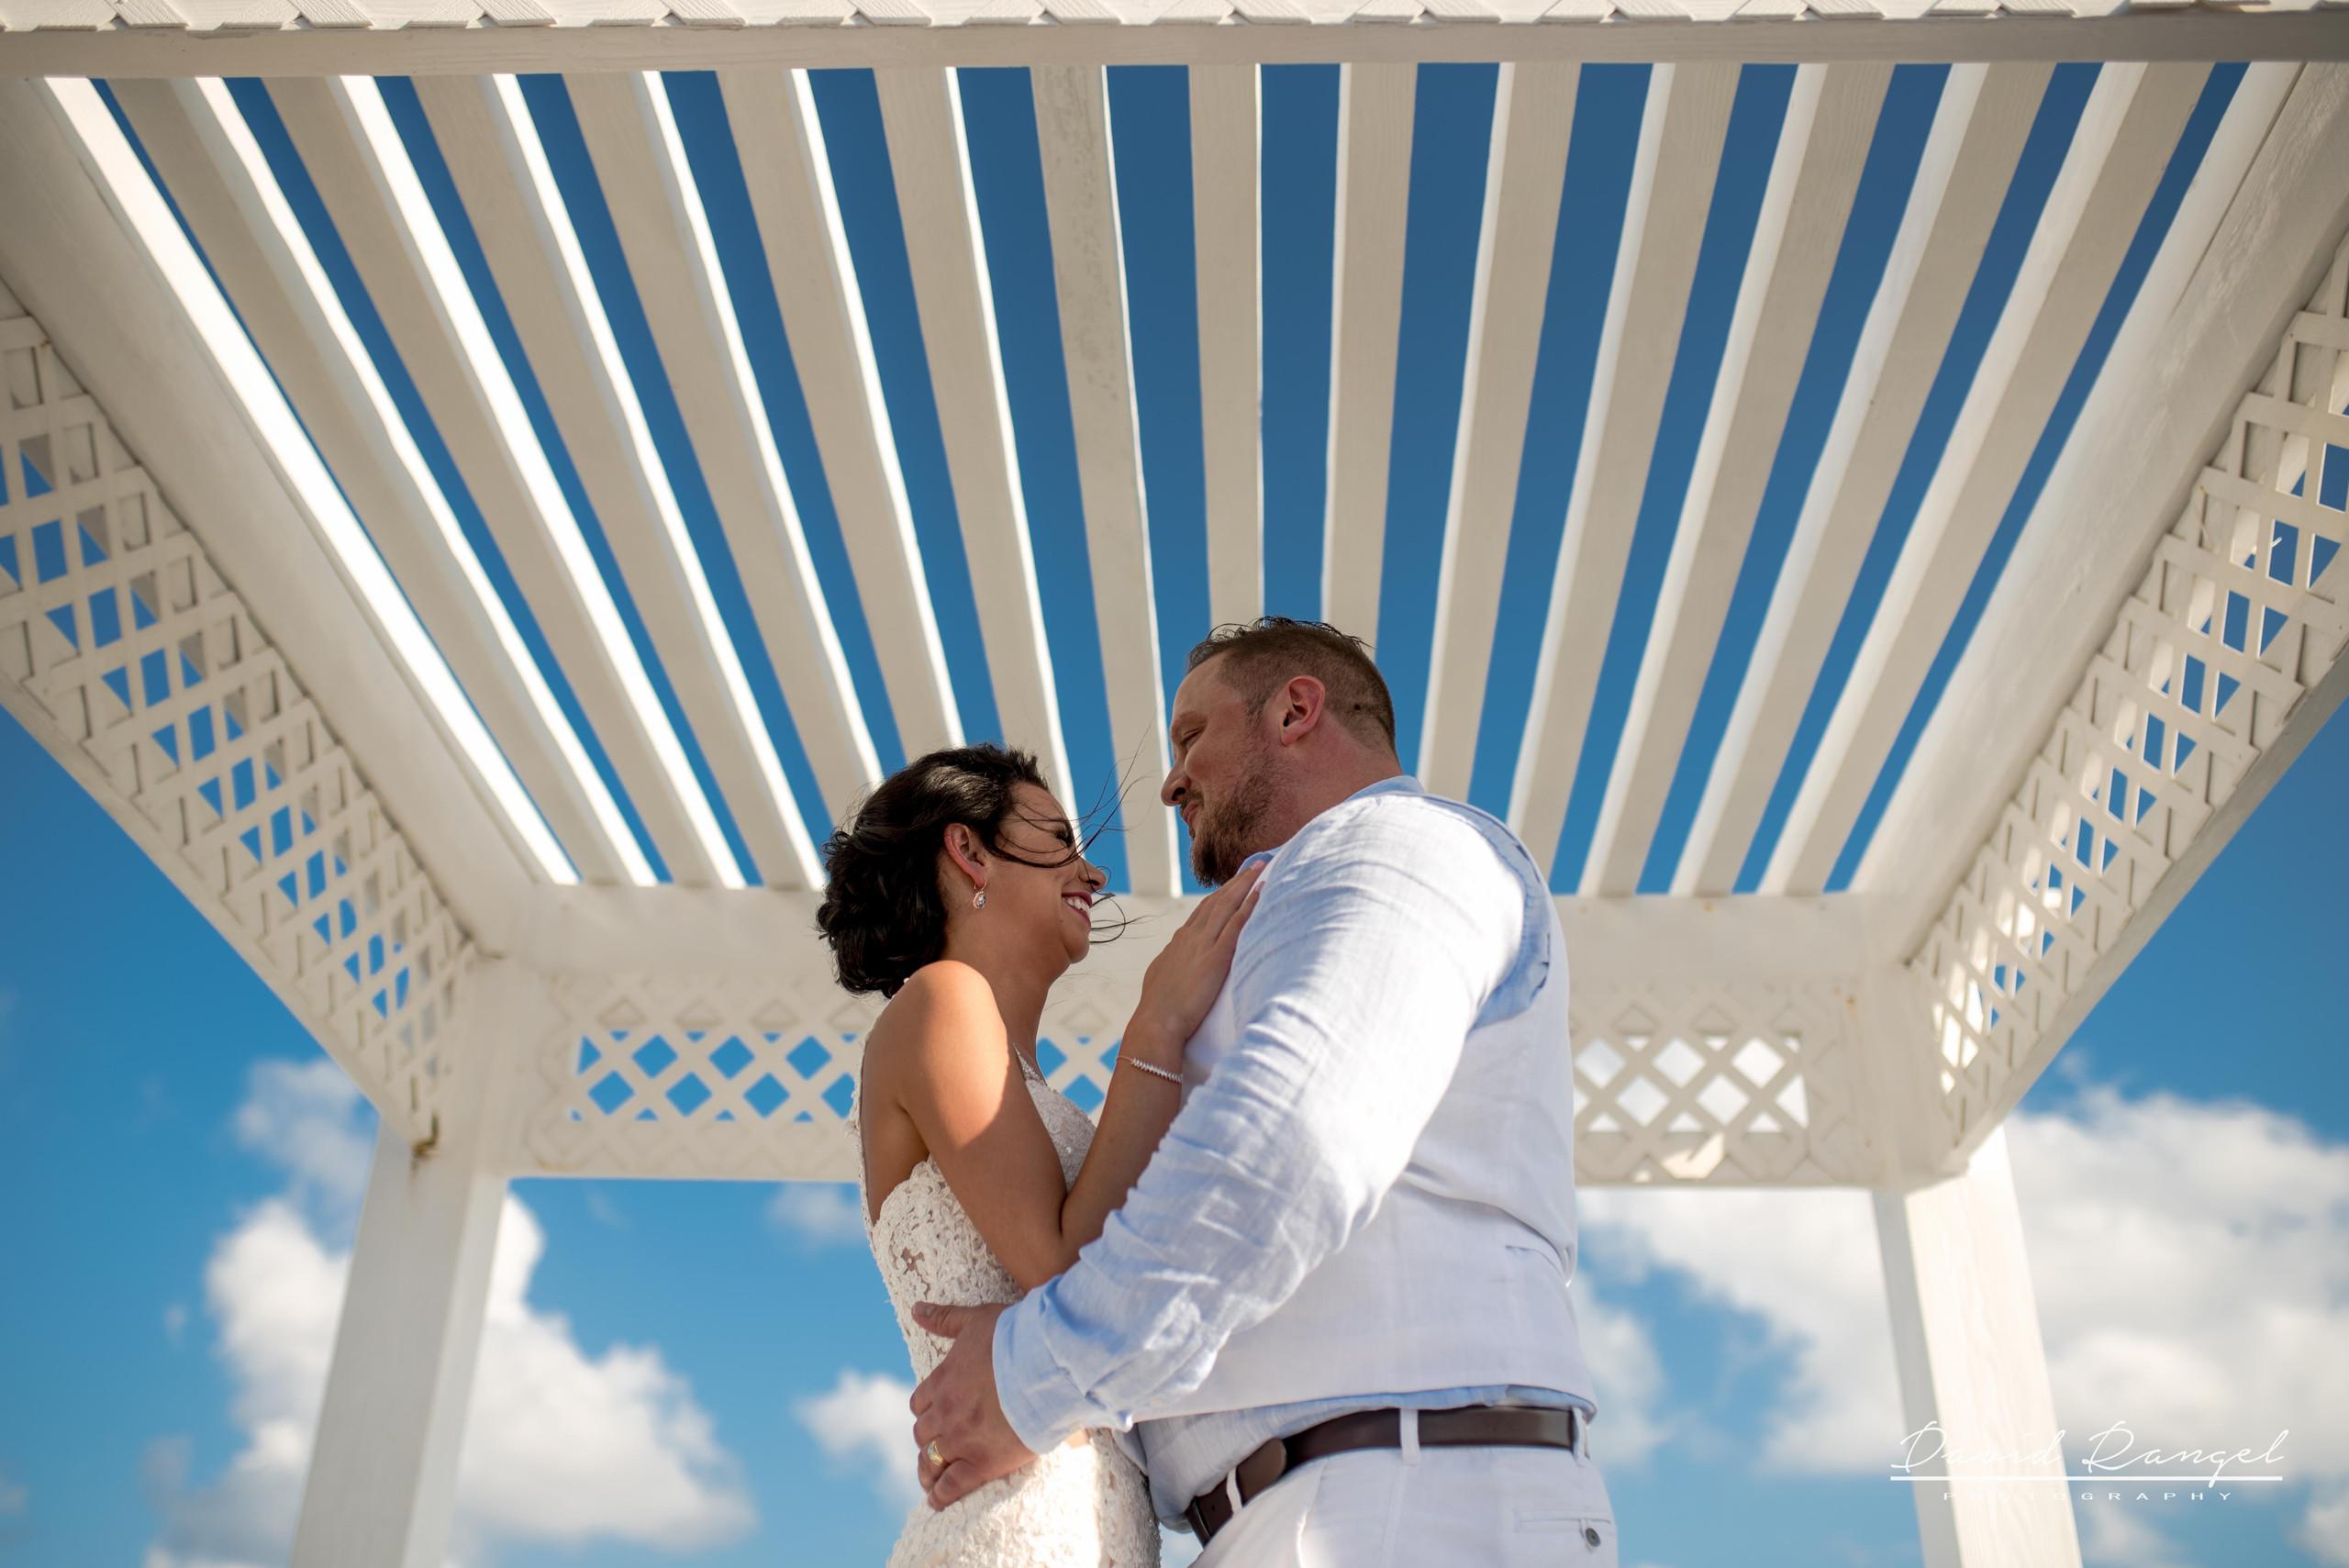 sky+deck+wedding+couple+photo+bride+groom+gazebo